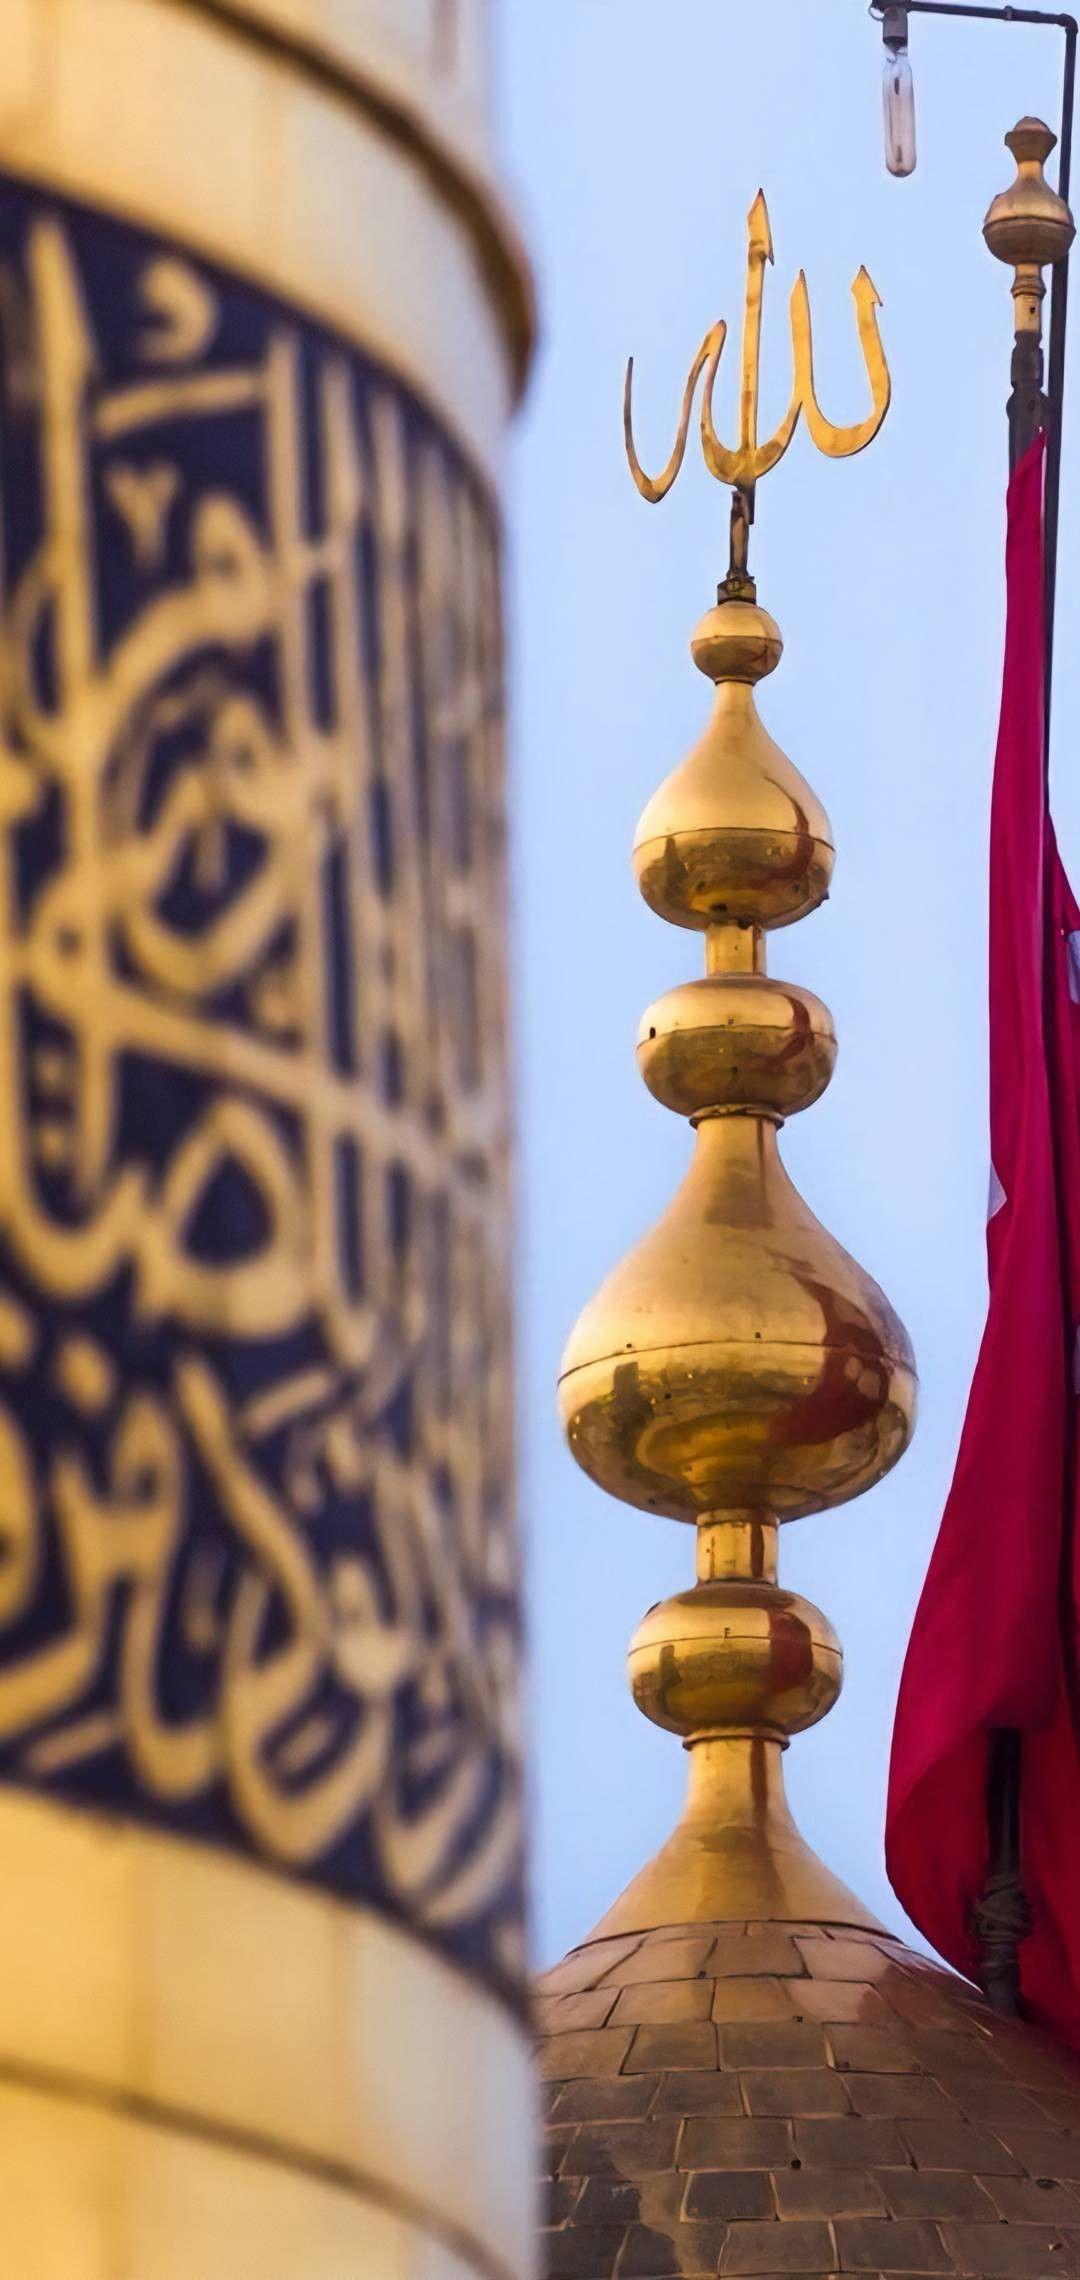 Pin By Fatemeh Khademi On Quotes Muharram Wallpaper Imam Hussain Wallpapers Islamic Wallpaper Hd